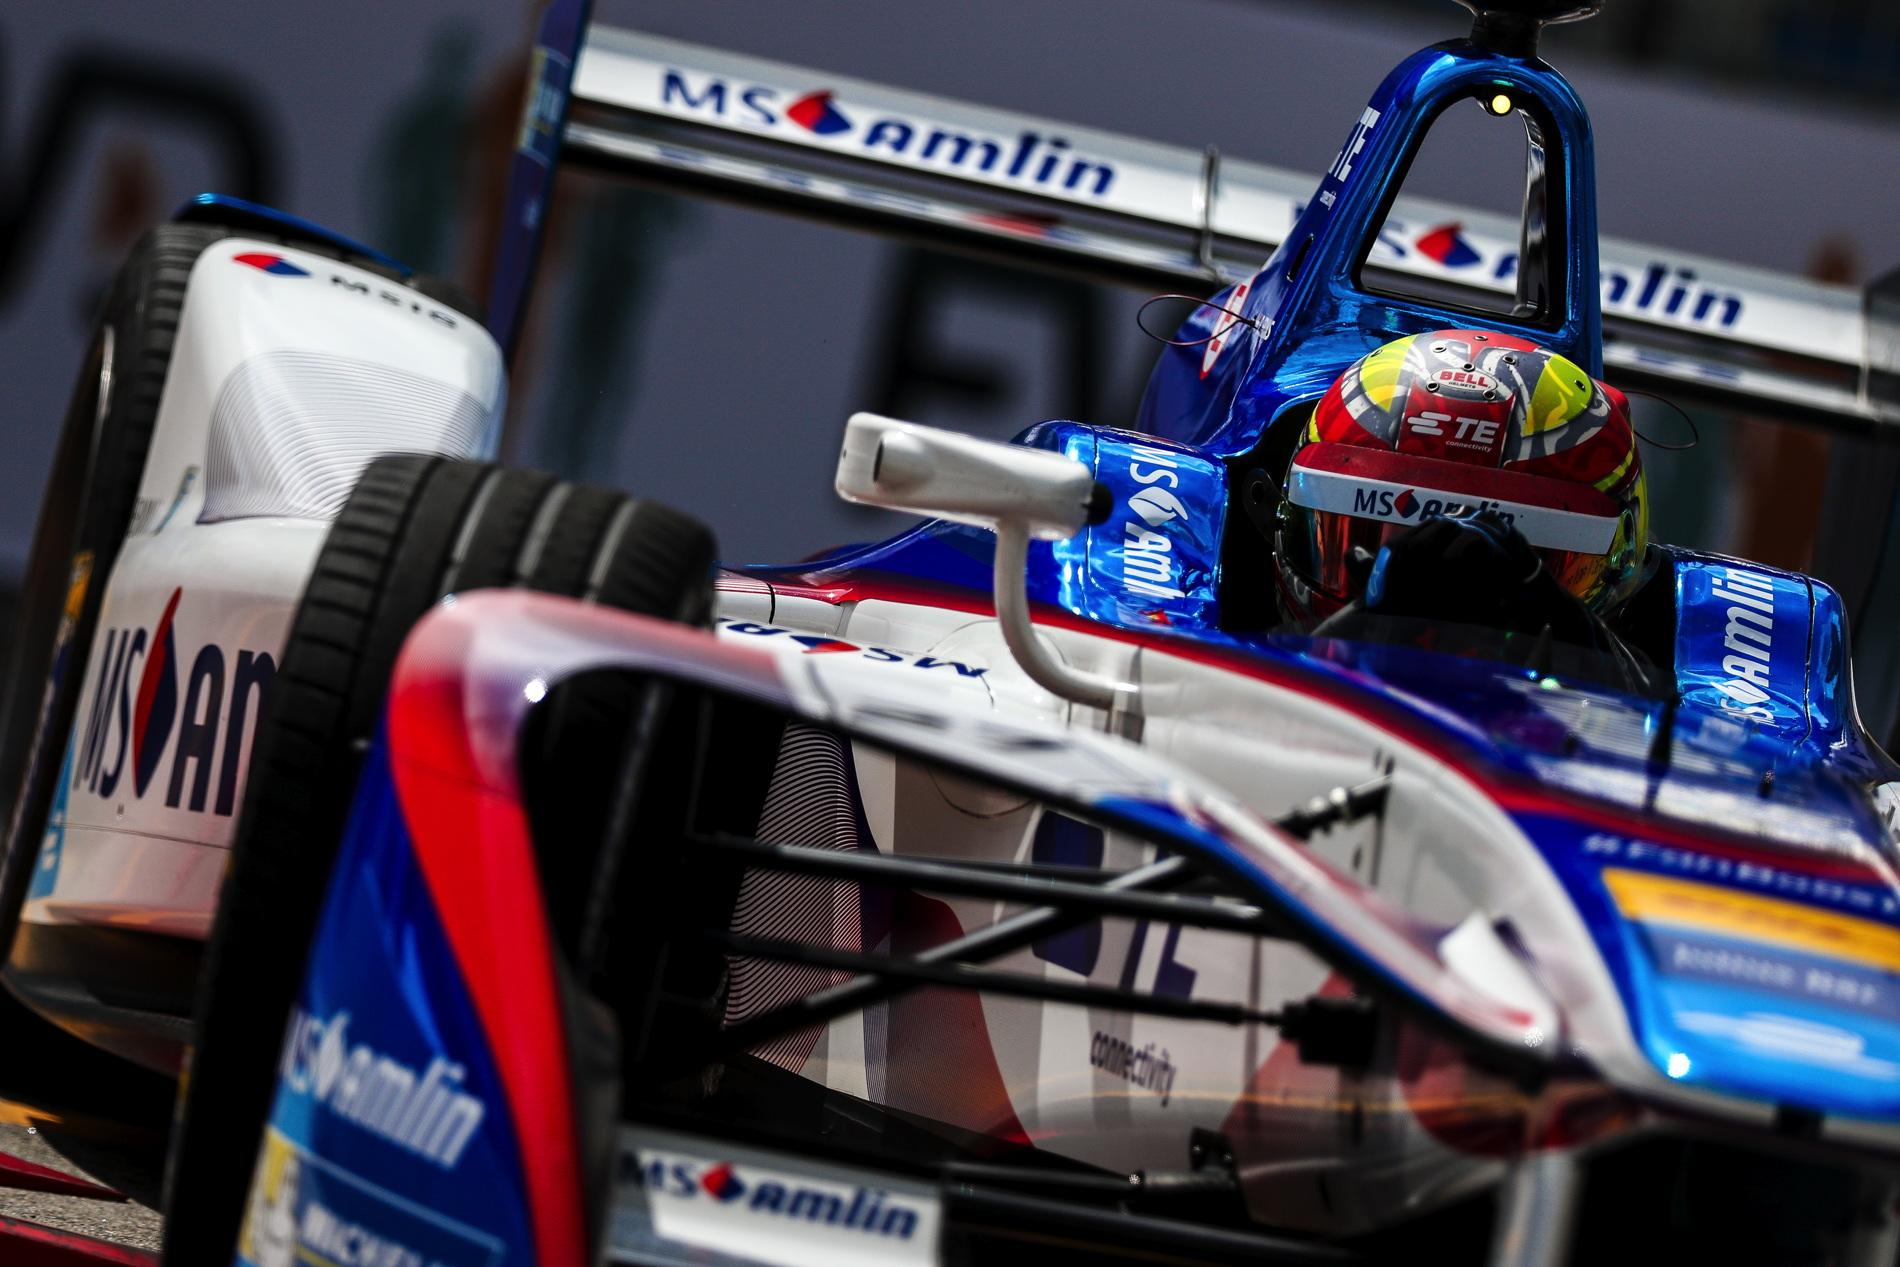 MS Amlin Andretti Honk Kong ePrix 27